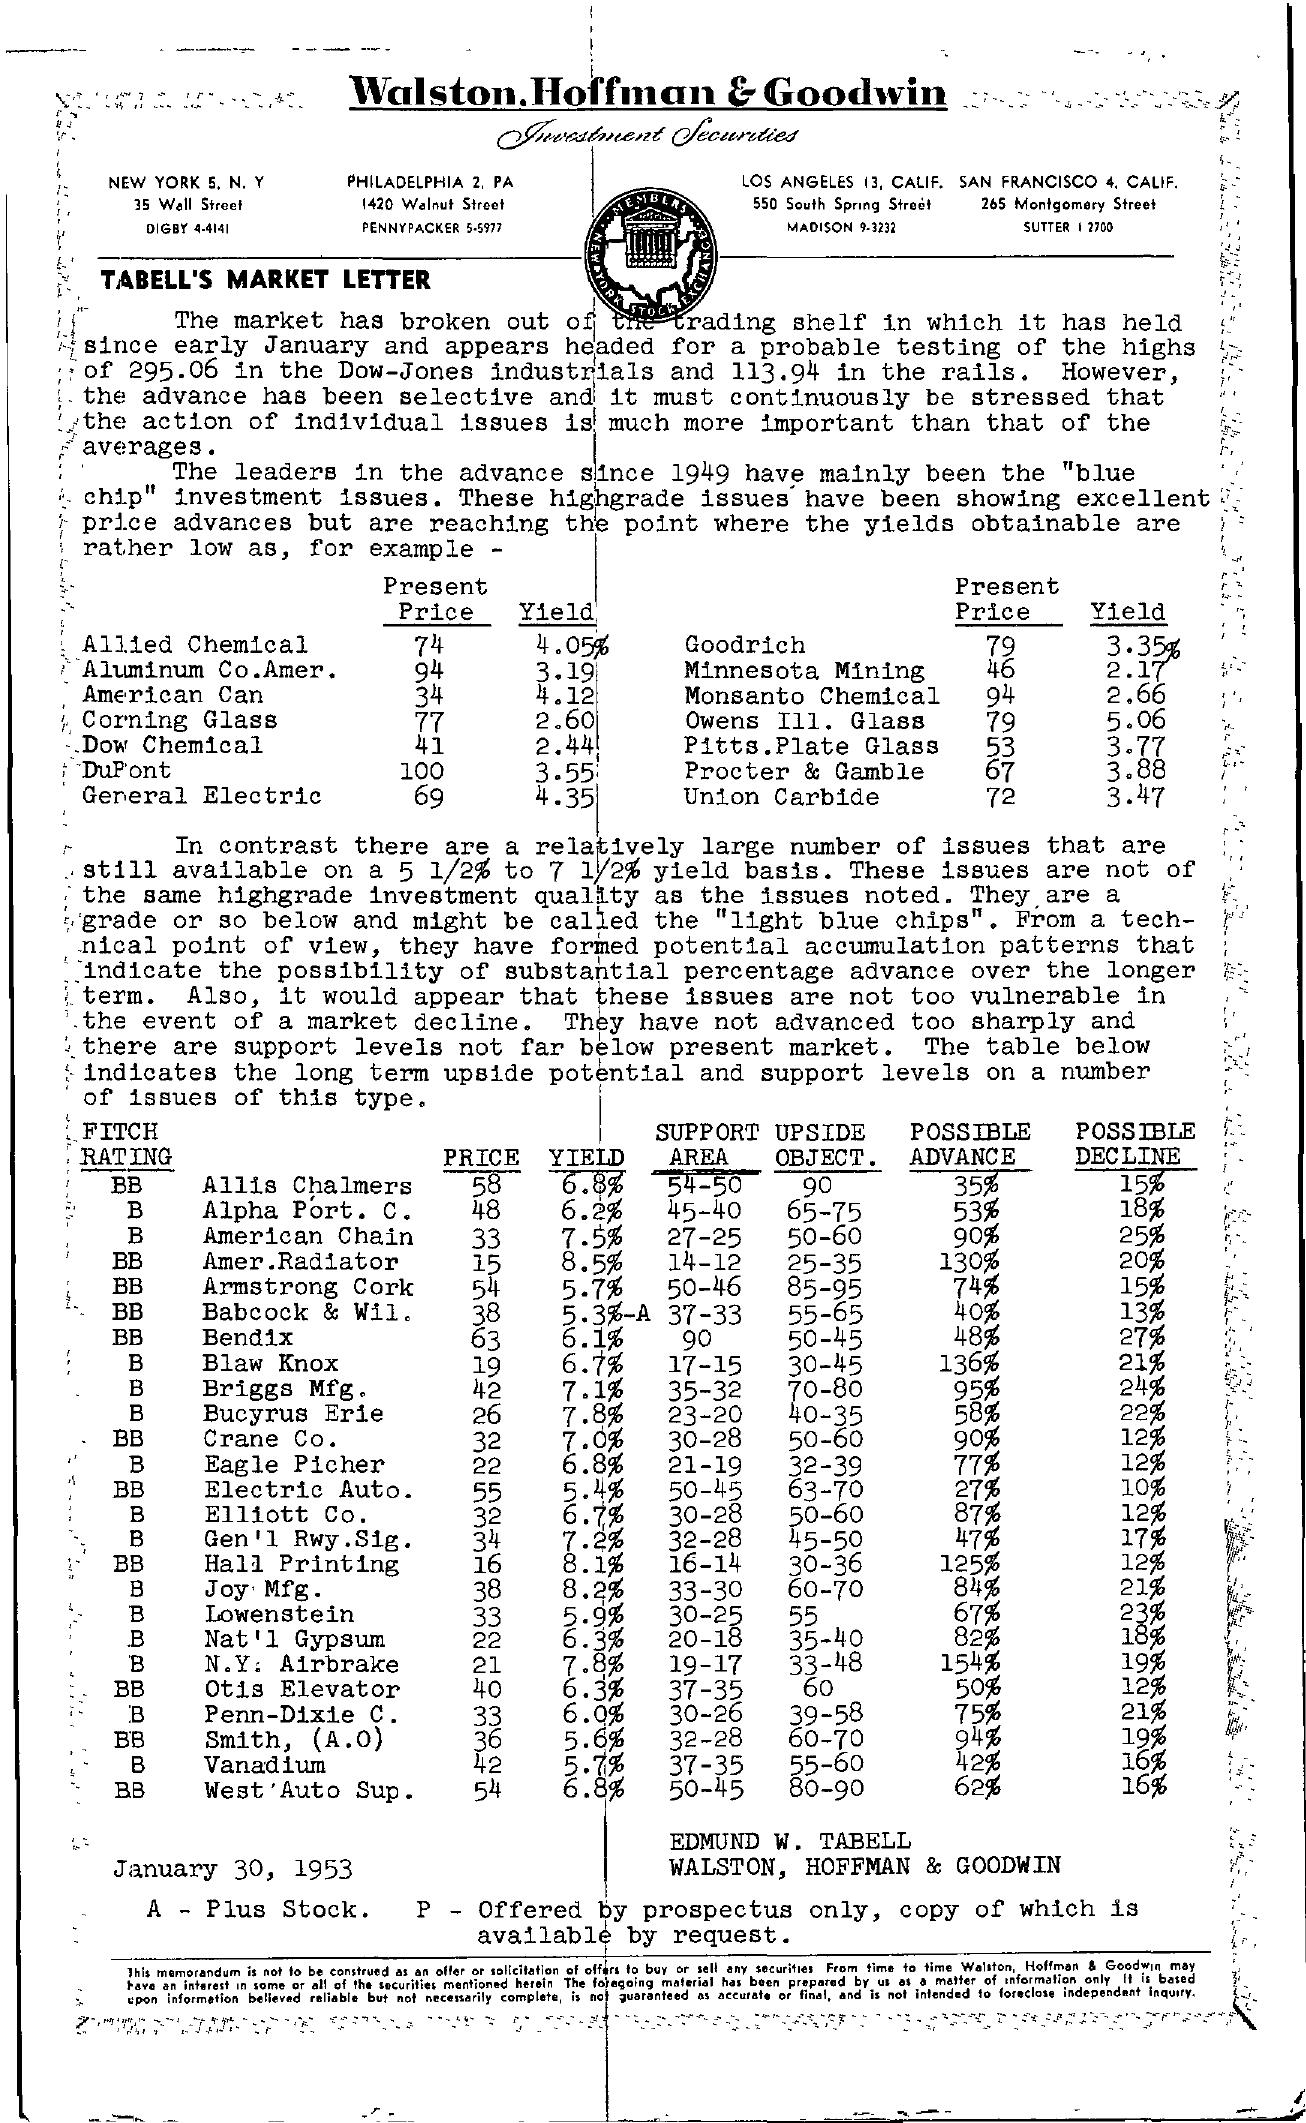 Tabell's Market Letter - January 30, 1953